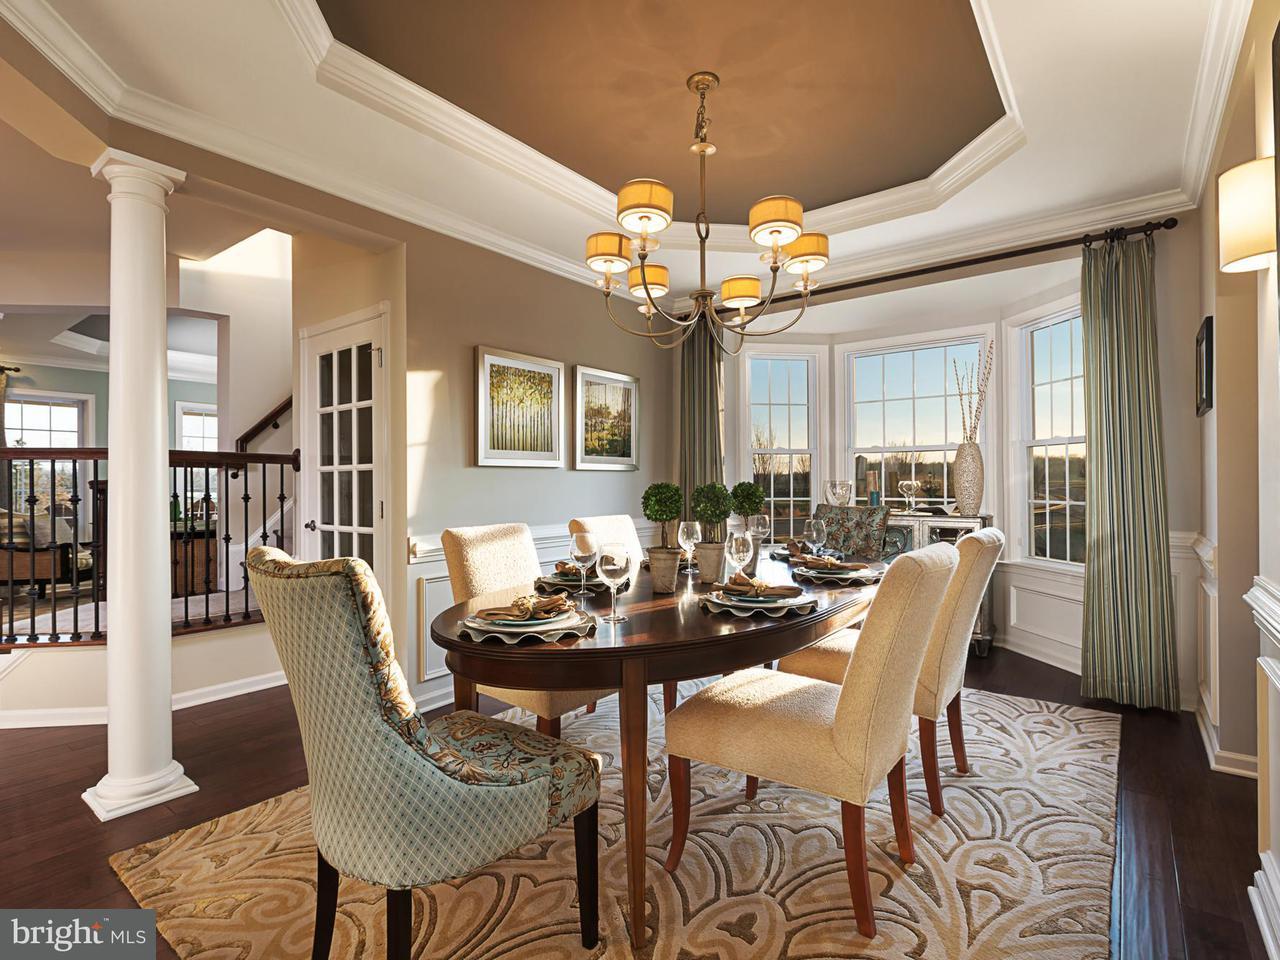 Additional photo for property listing at 8238 SAINT FRANCIS Drive 8238 SAINT FRANCIS Drive Severn, Μεριλαντ 21144 Ηνωμενεσ Πολιτειεσ